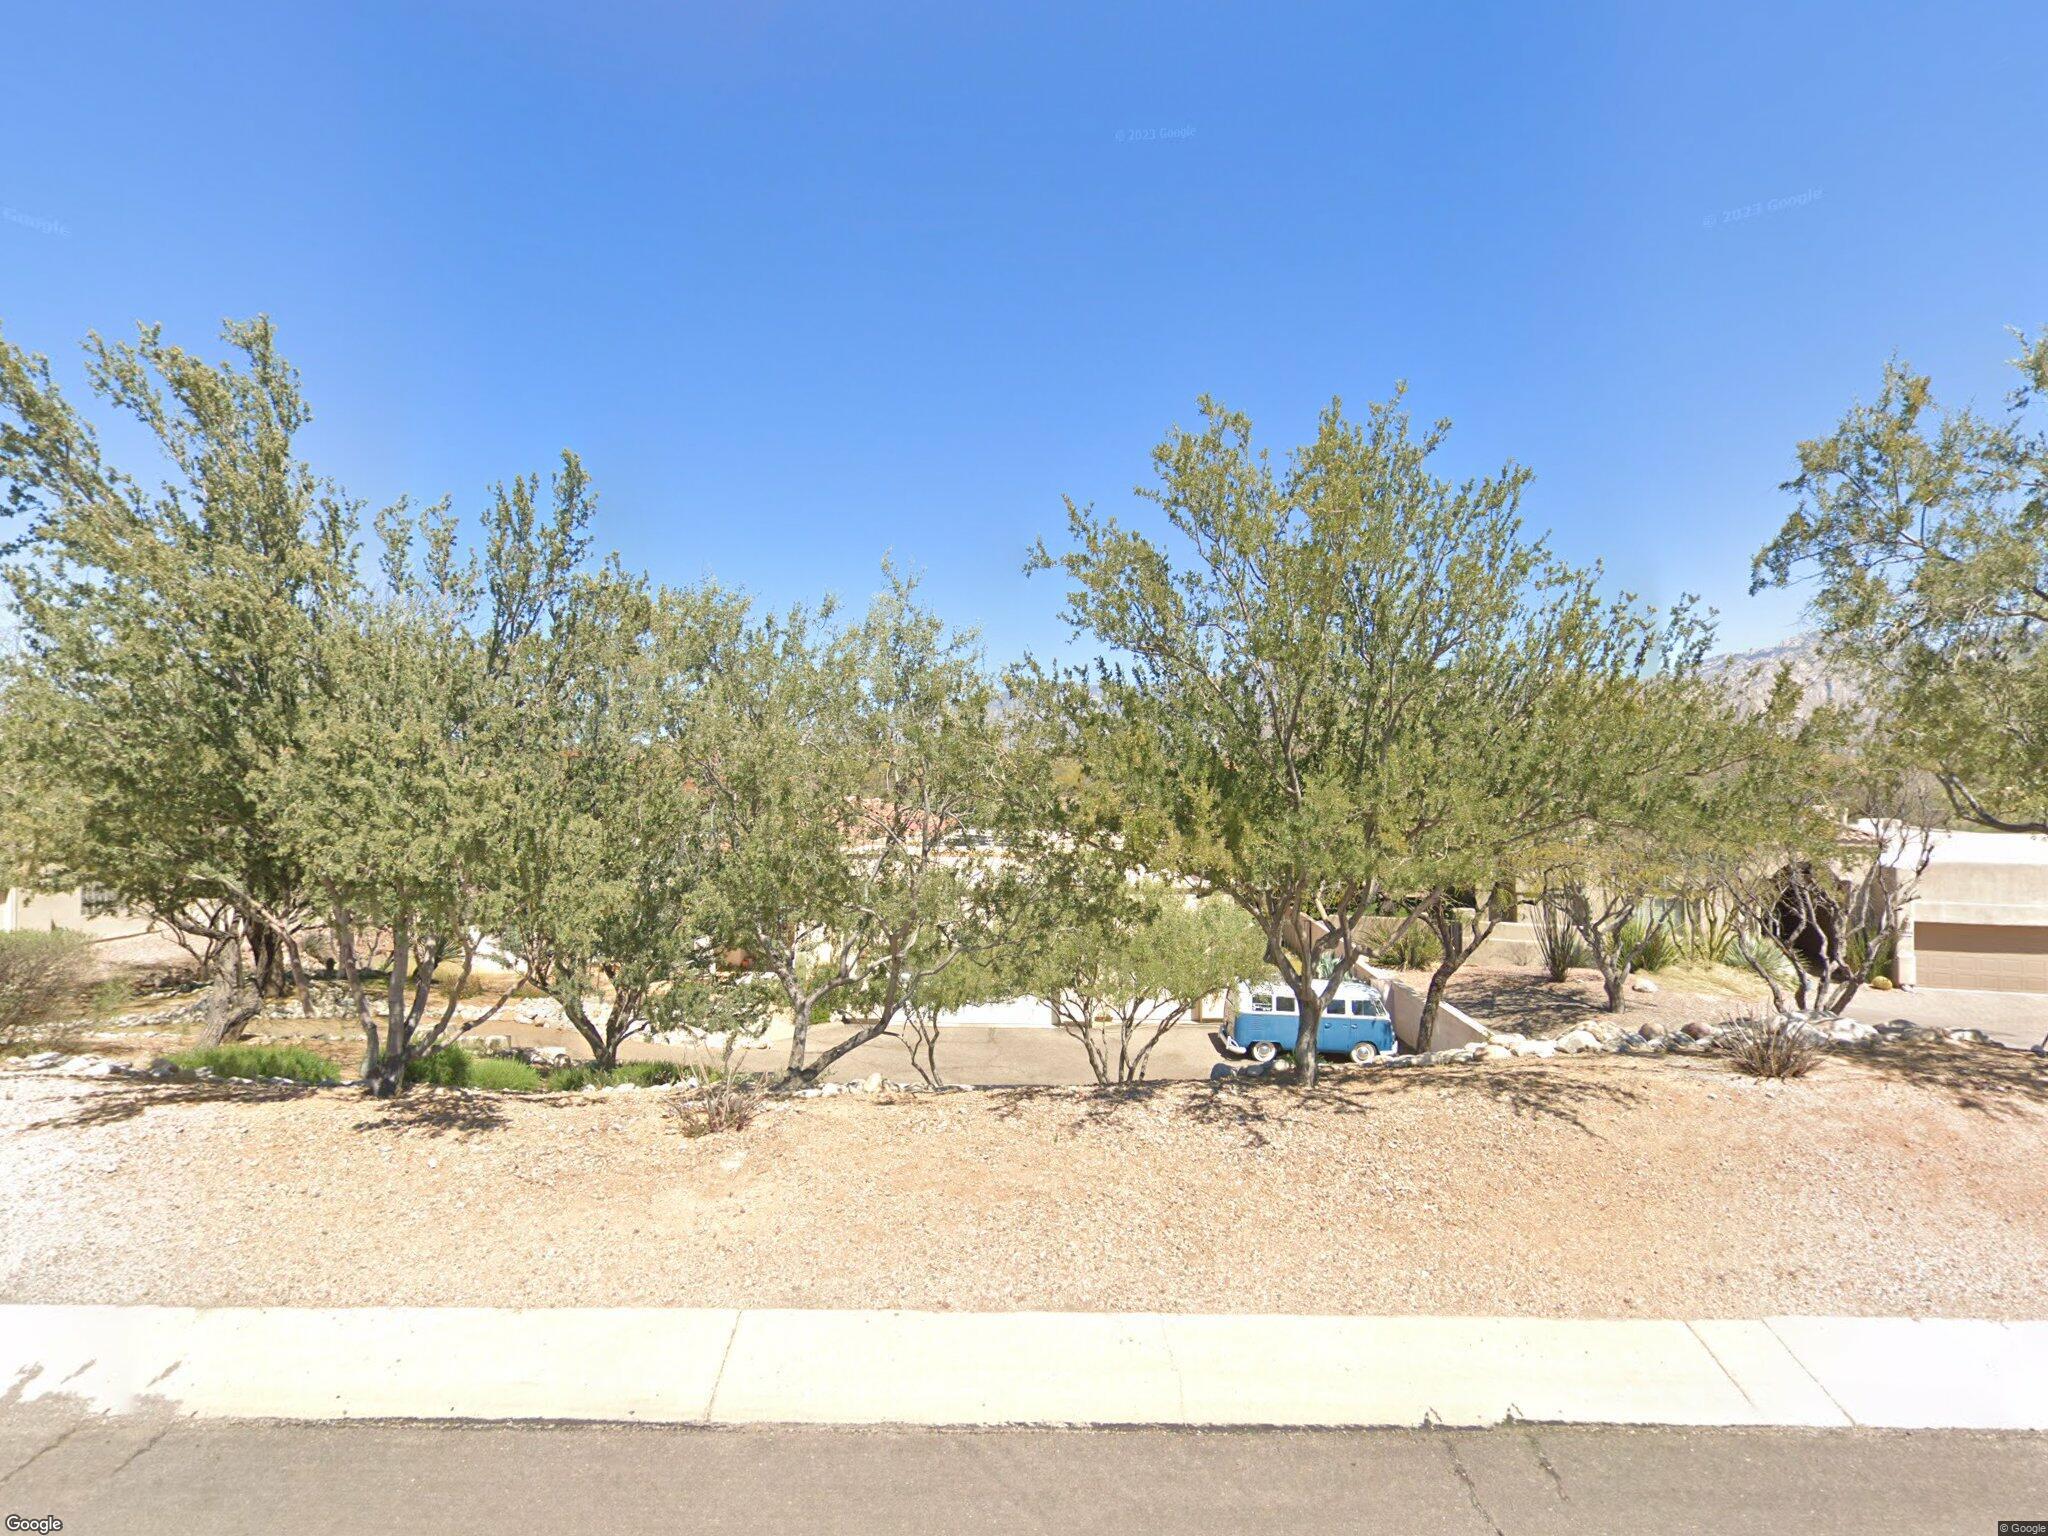 12100 N Copper Spring Trl, Oro Valley, AZ 85755 | Trulia